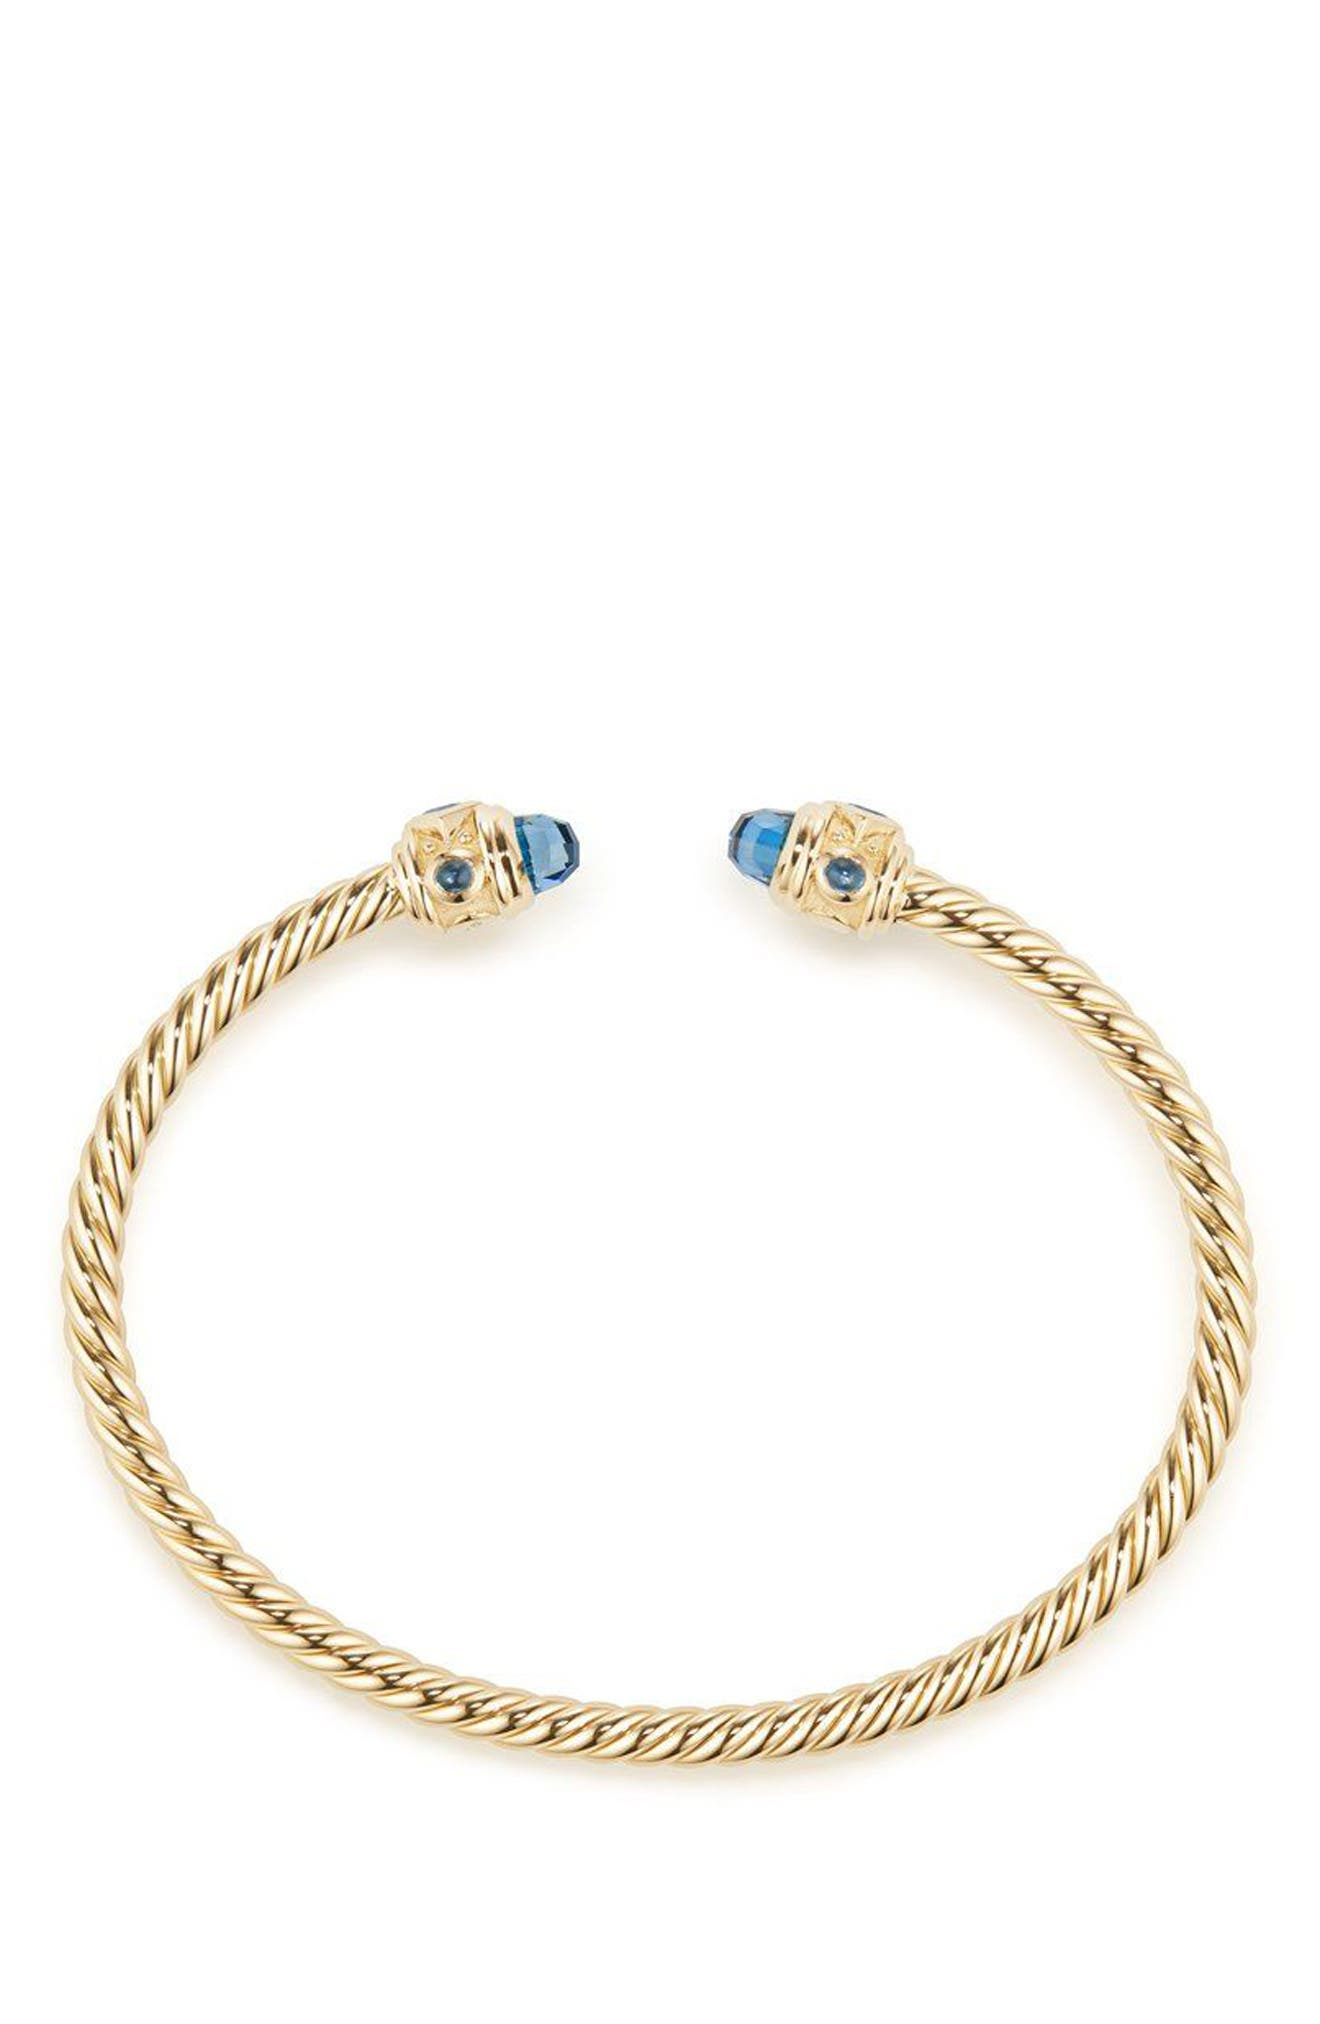 Renaissance Bracelet in 18K Gold, 3.5mm,                             Alternate thumbnail 2, color,                             GOLD/ HAMPTON BLUE TOPAZ